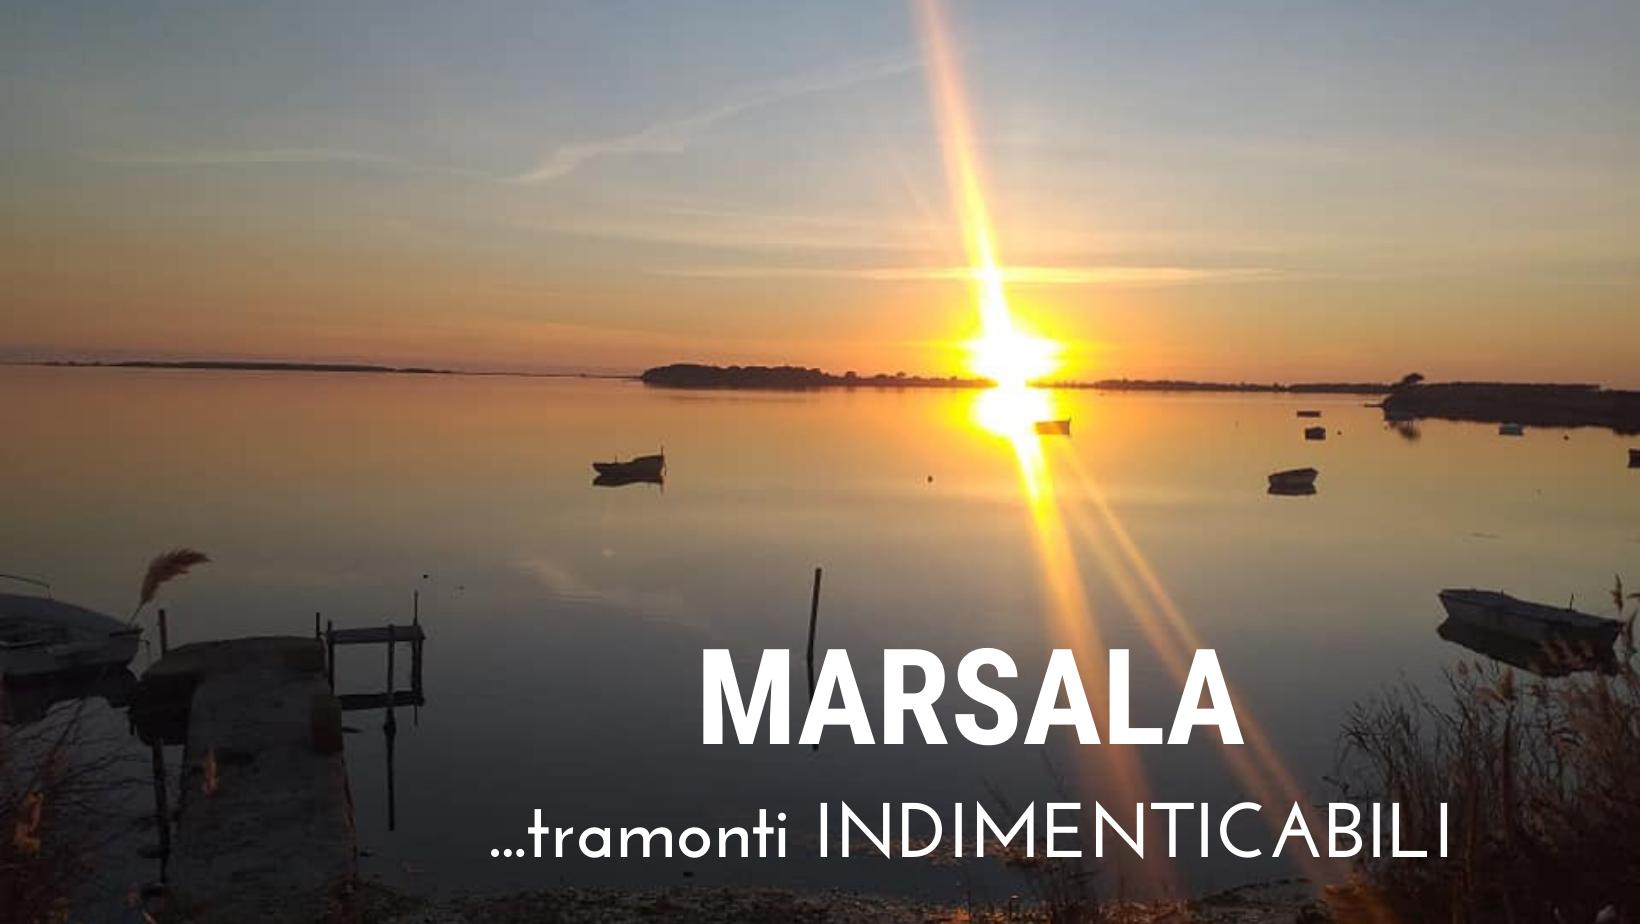 Marsala tramonti